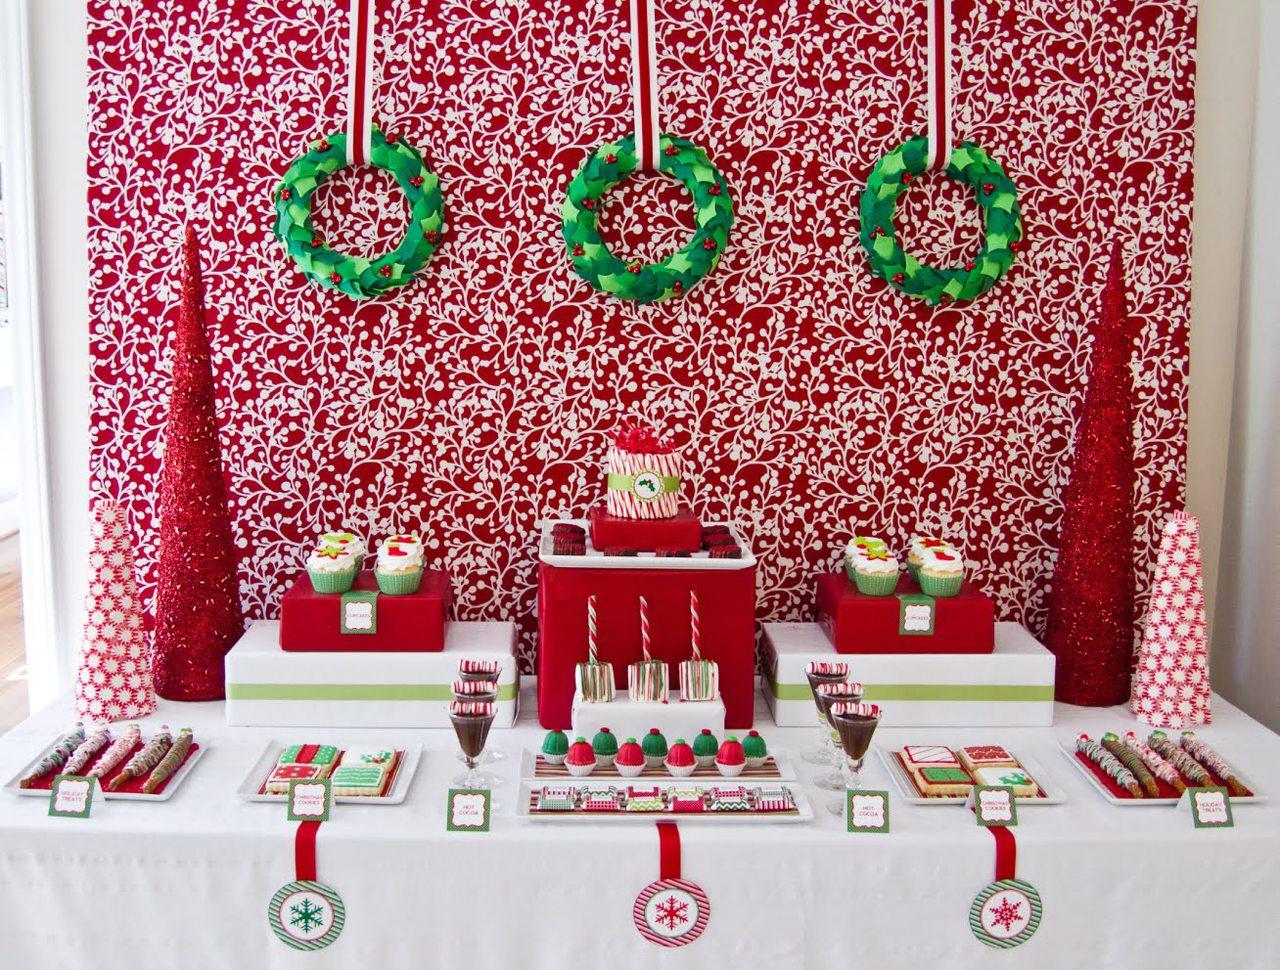 decorarea de revelion